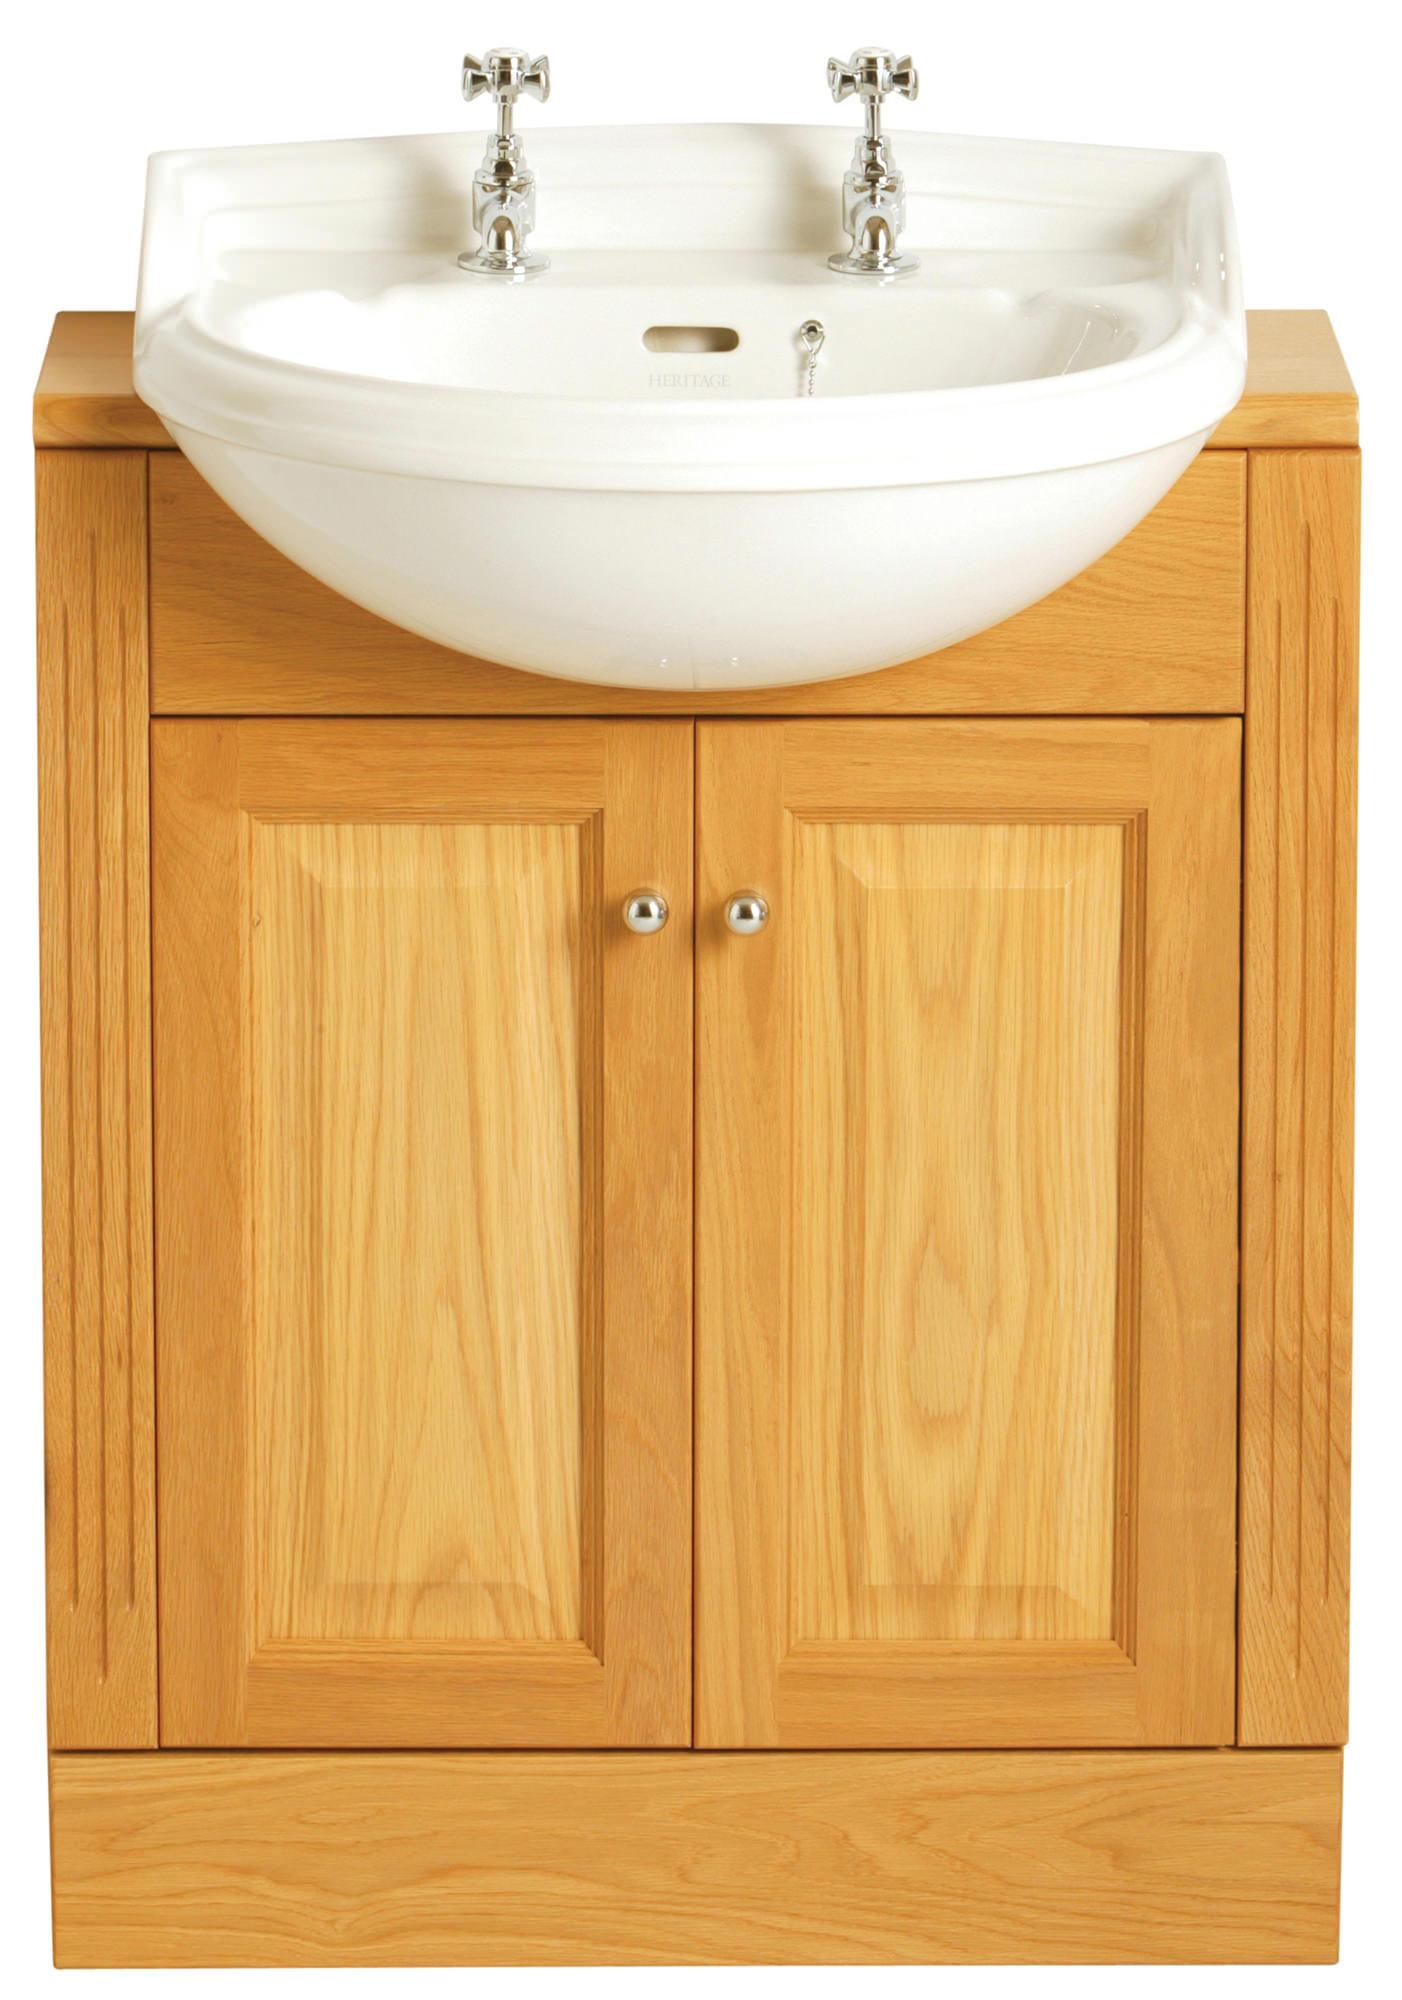 Heritage dorchester 1 taphole medium semi recessed basin for Heritage bathrooms